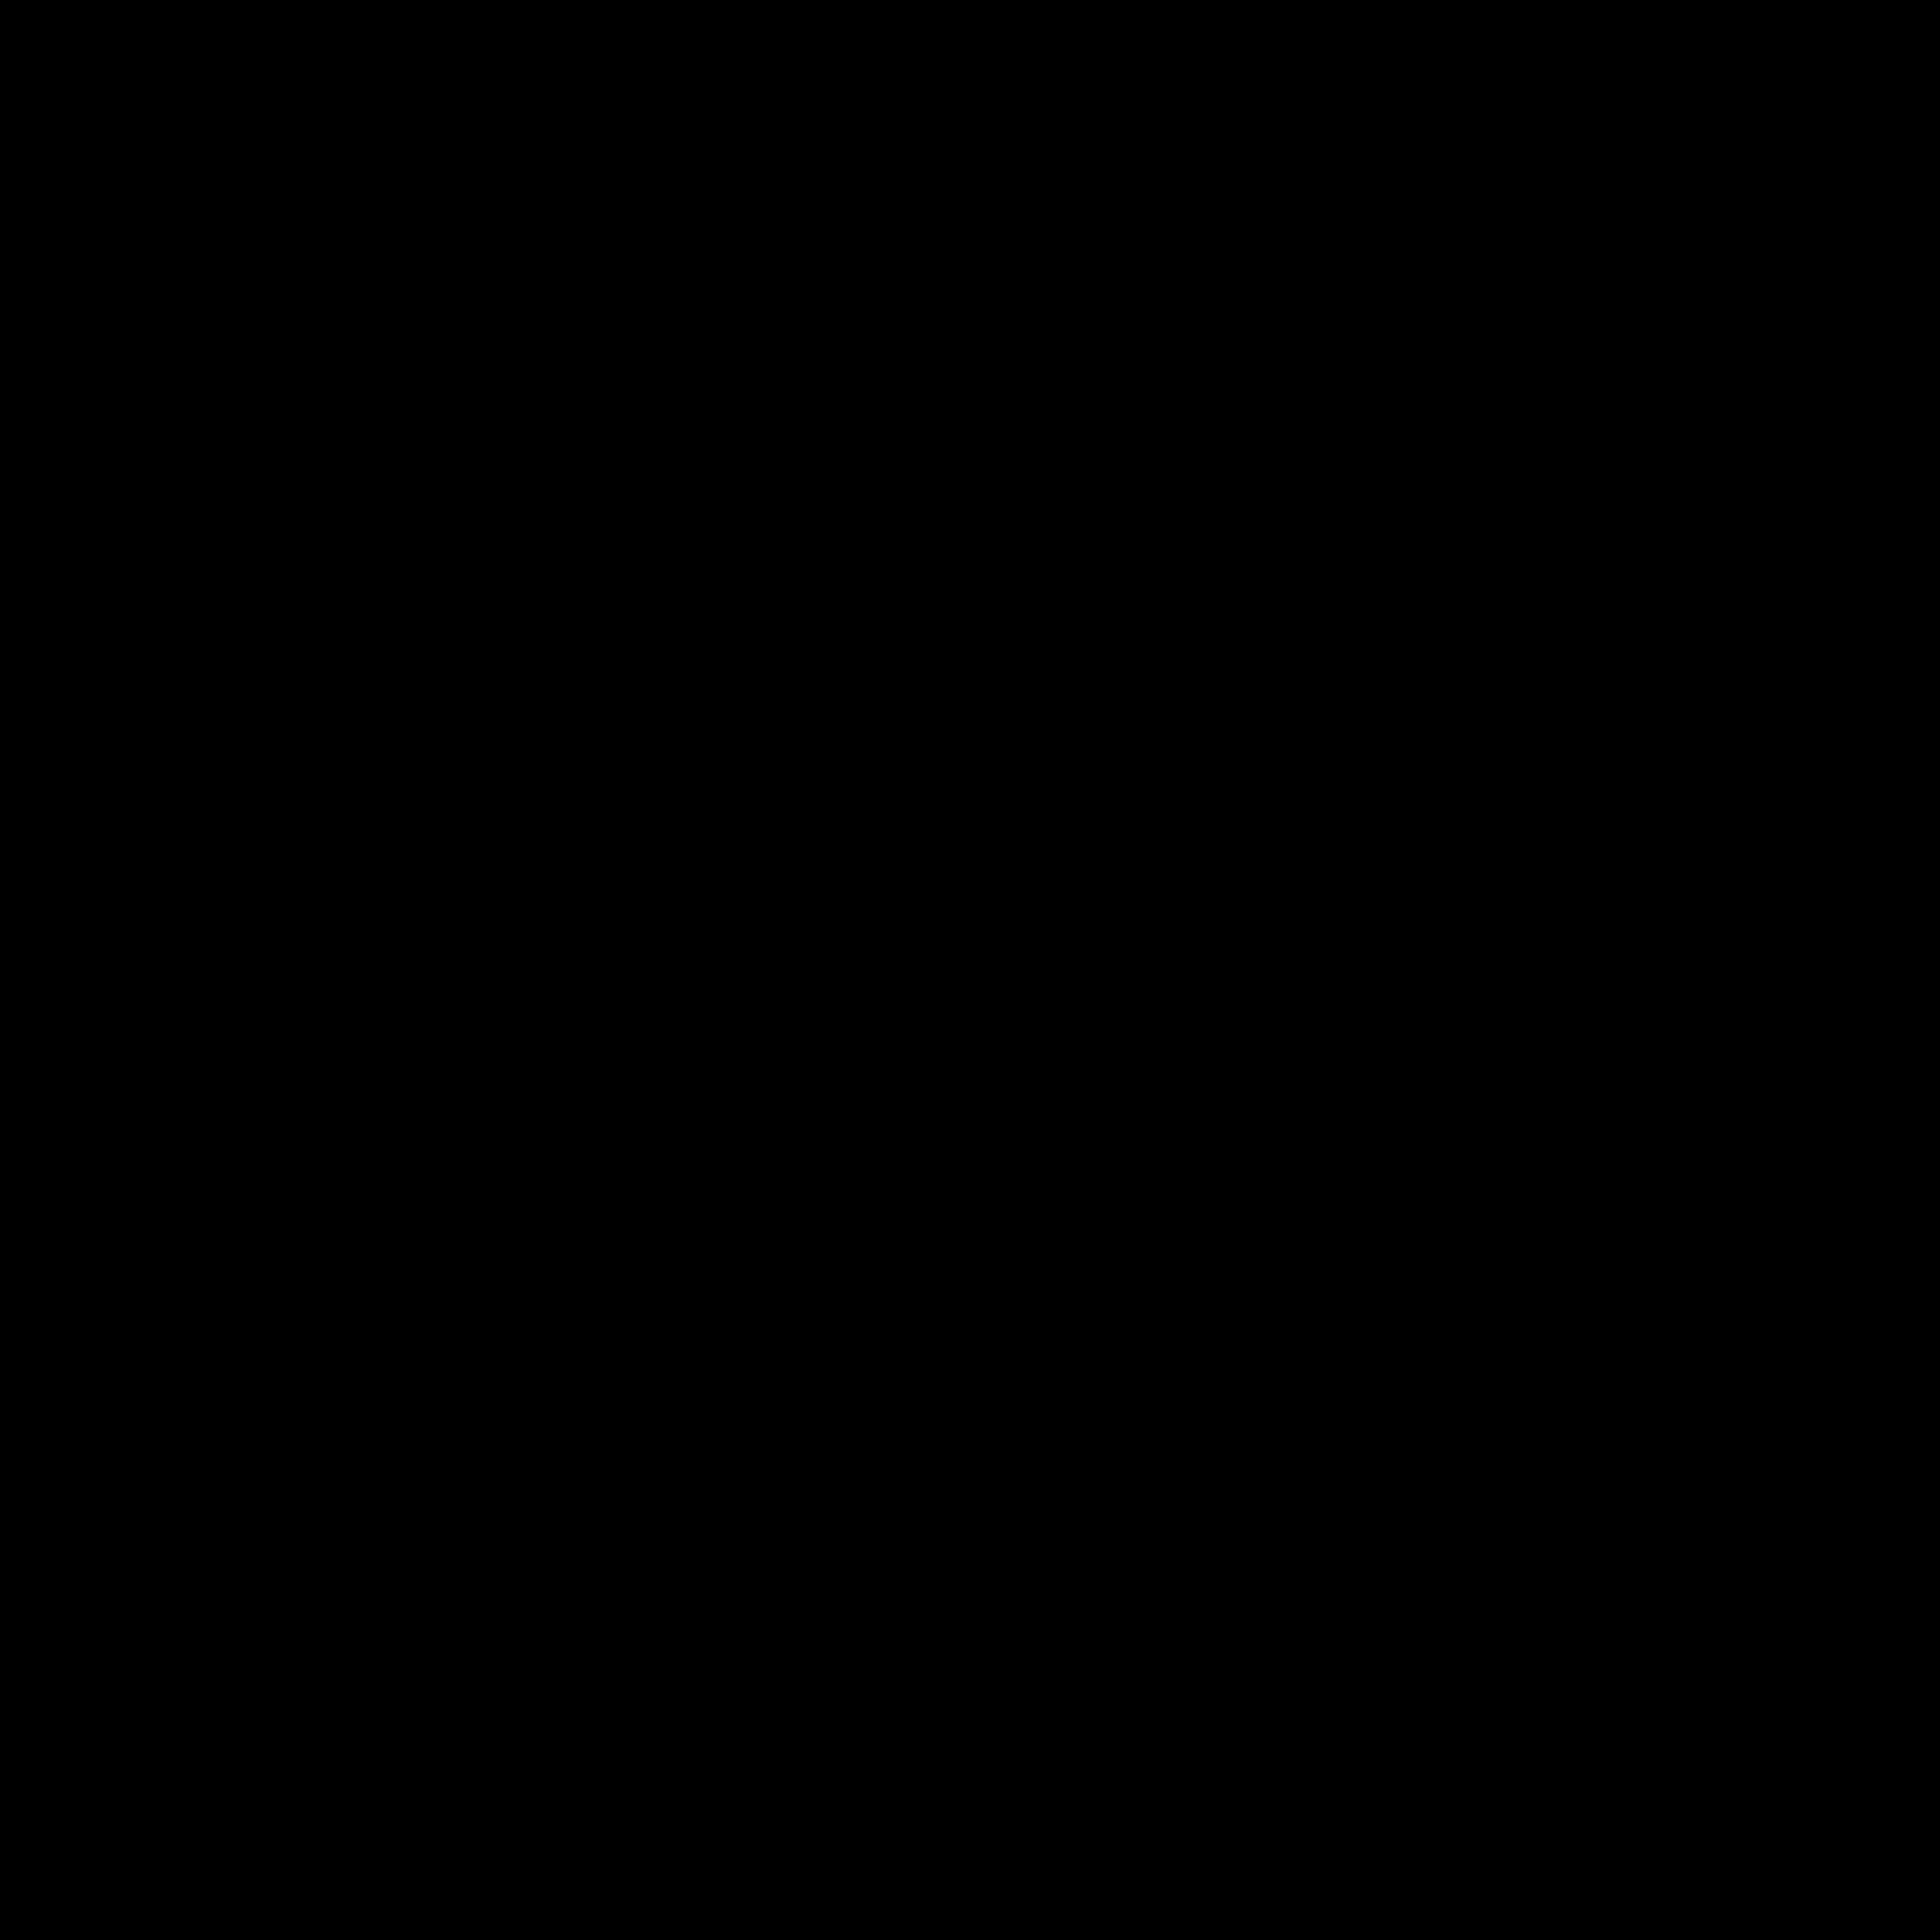 black, linkedin icon.